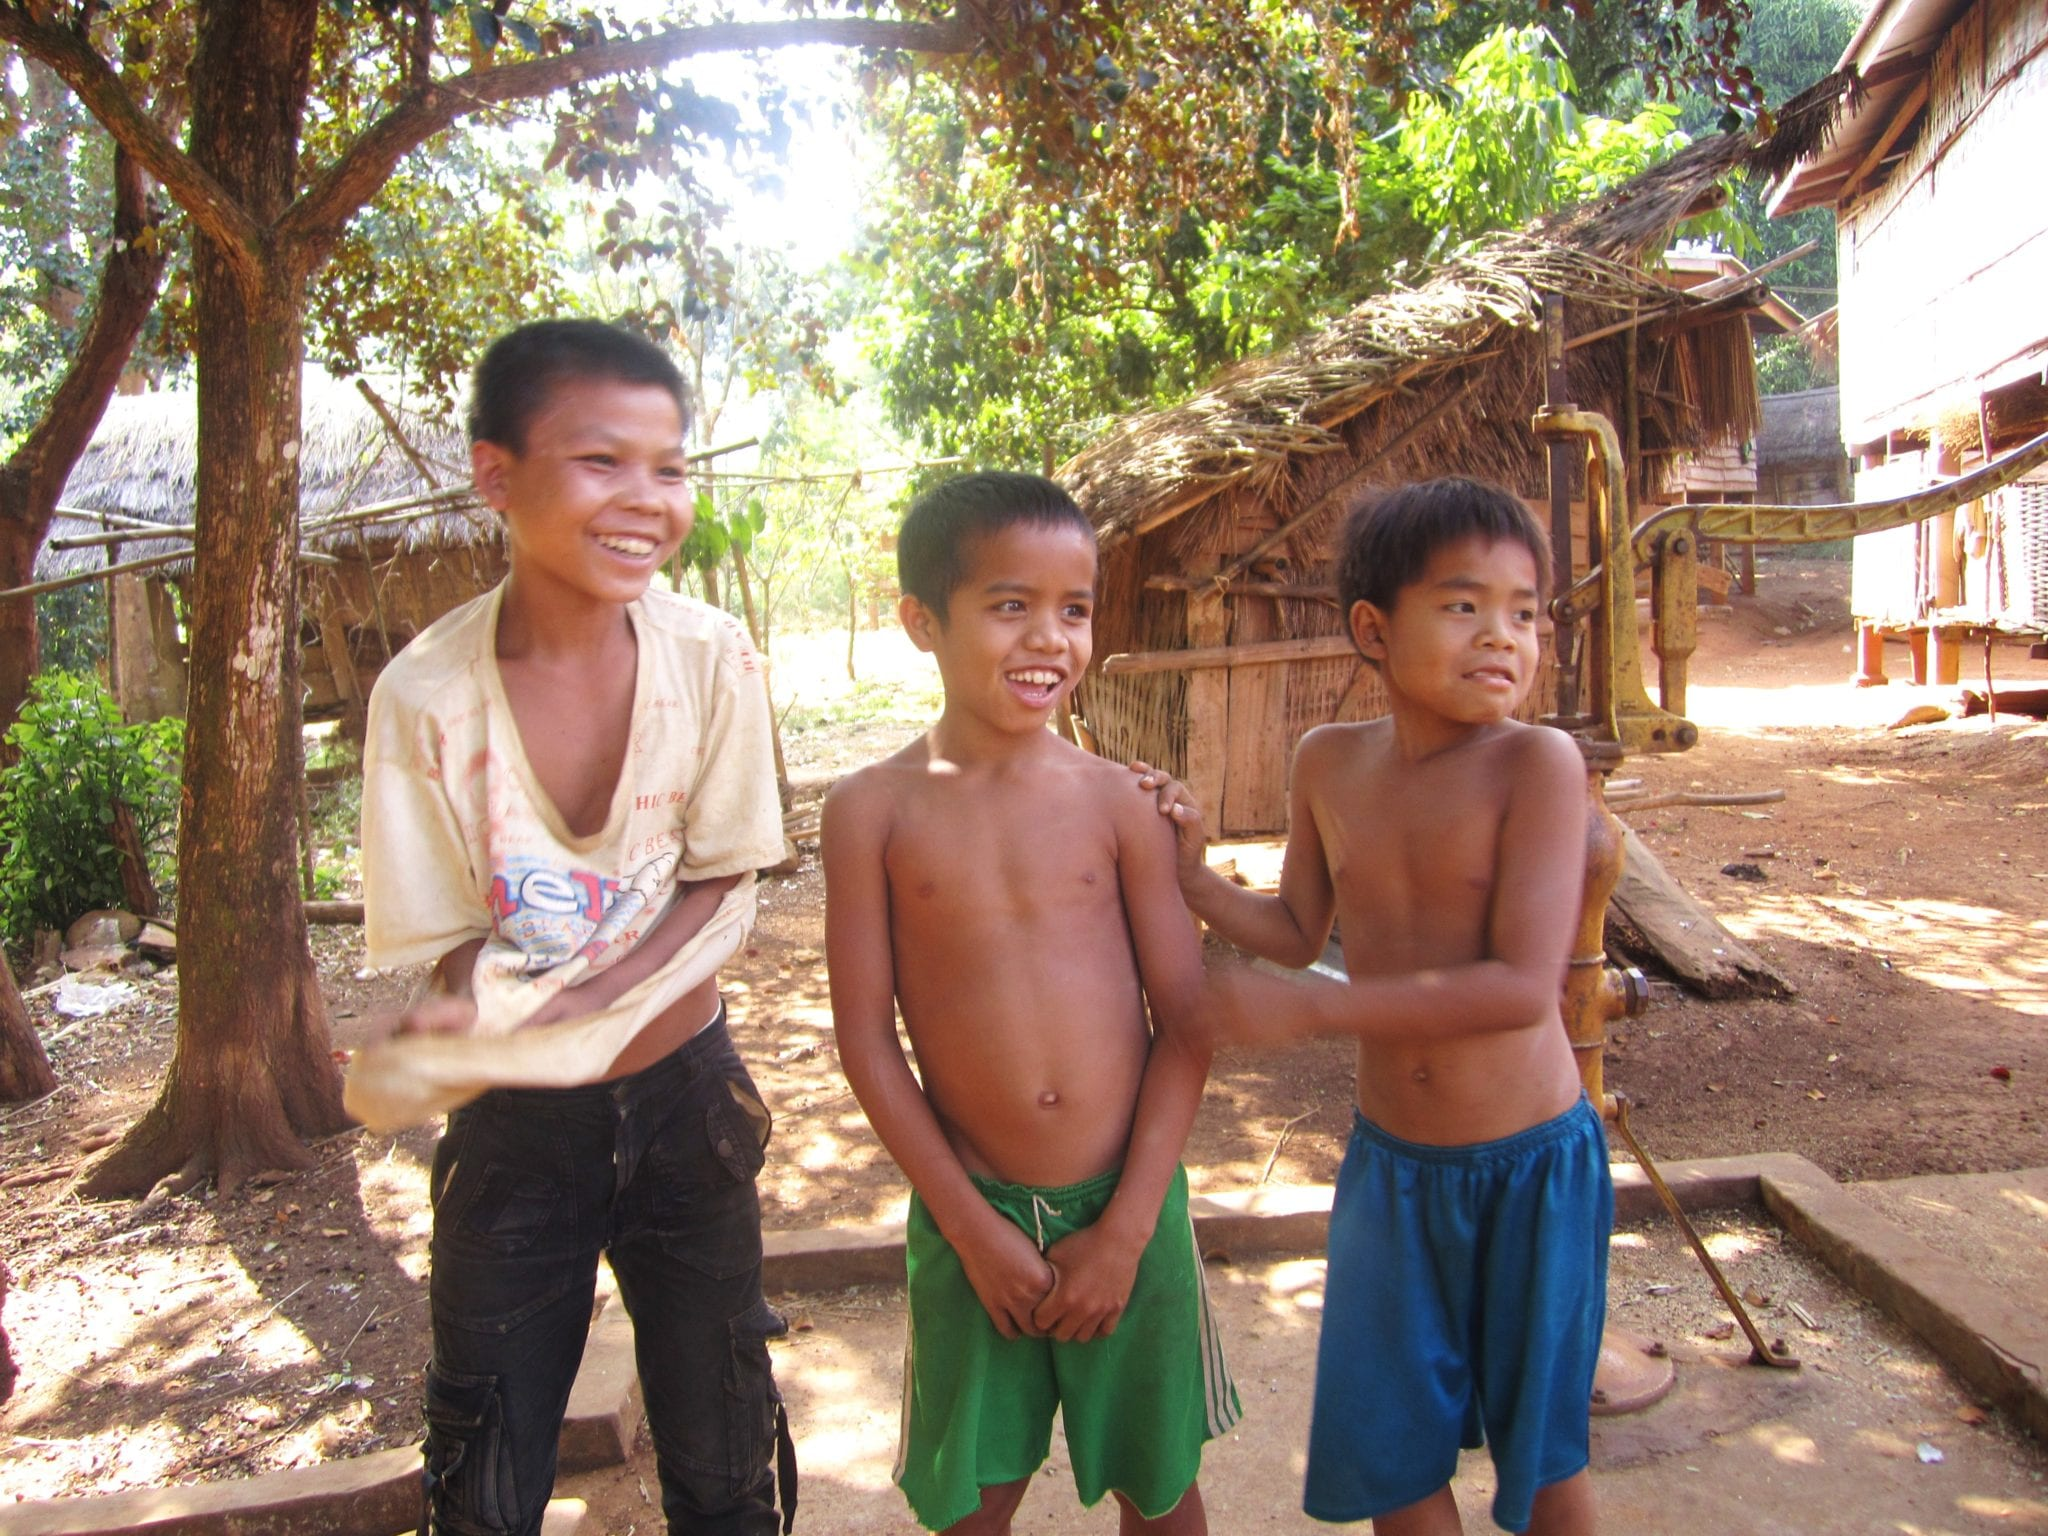 cambodian-boy-nude-lesbian-tennis-sex